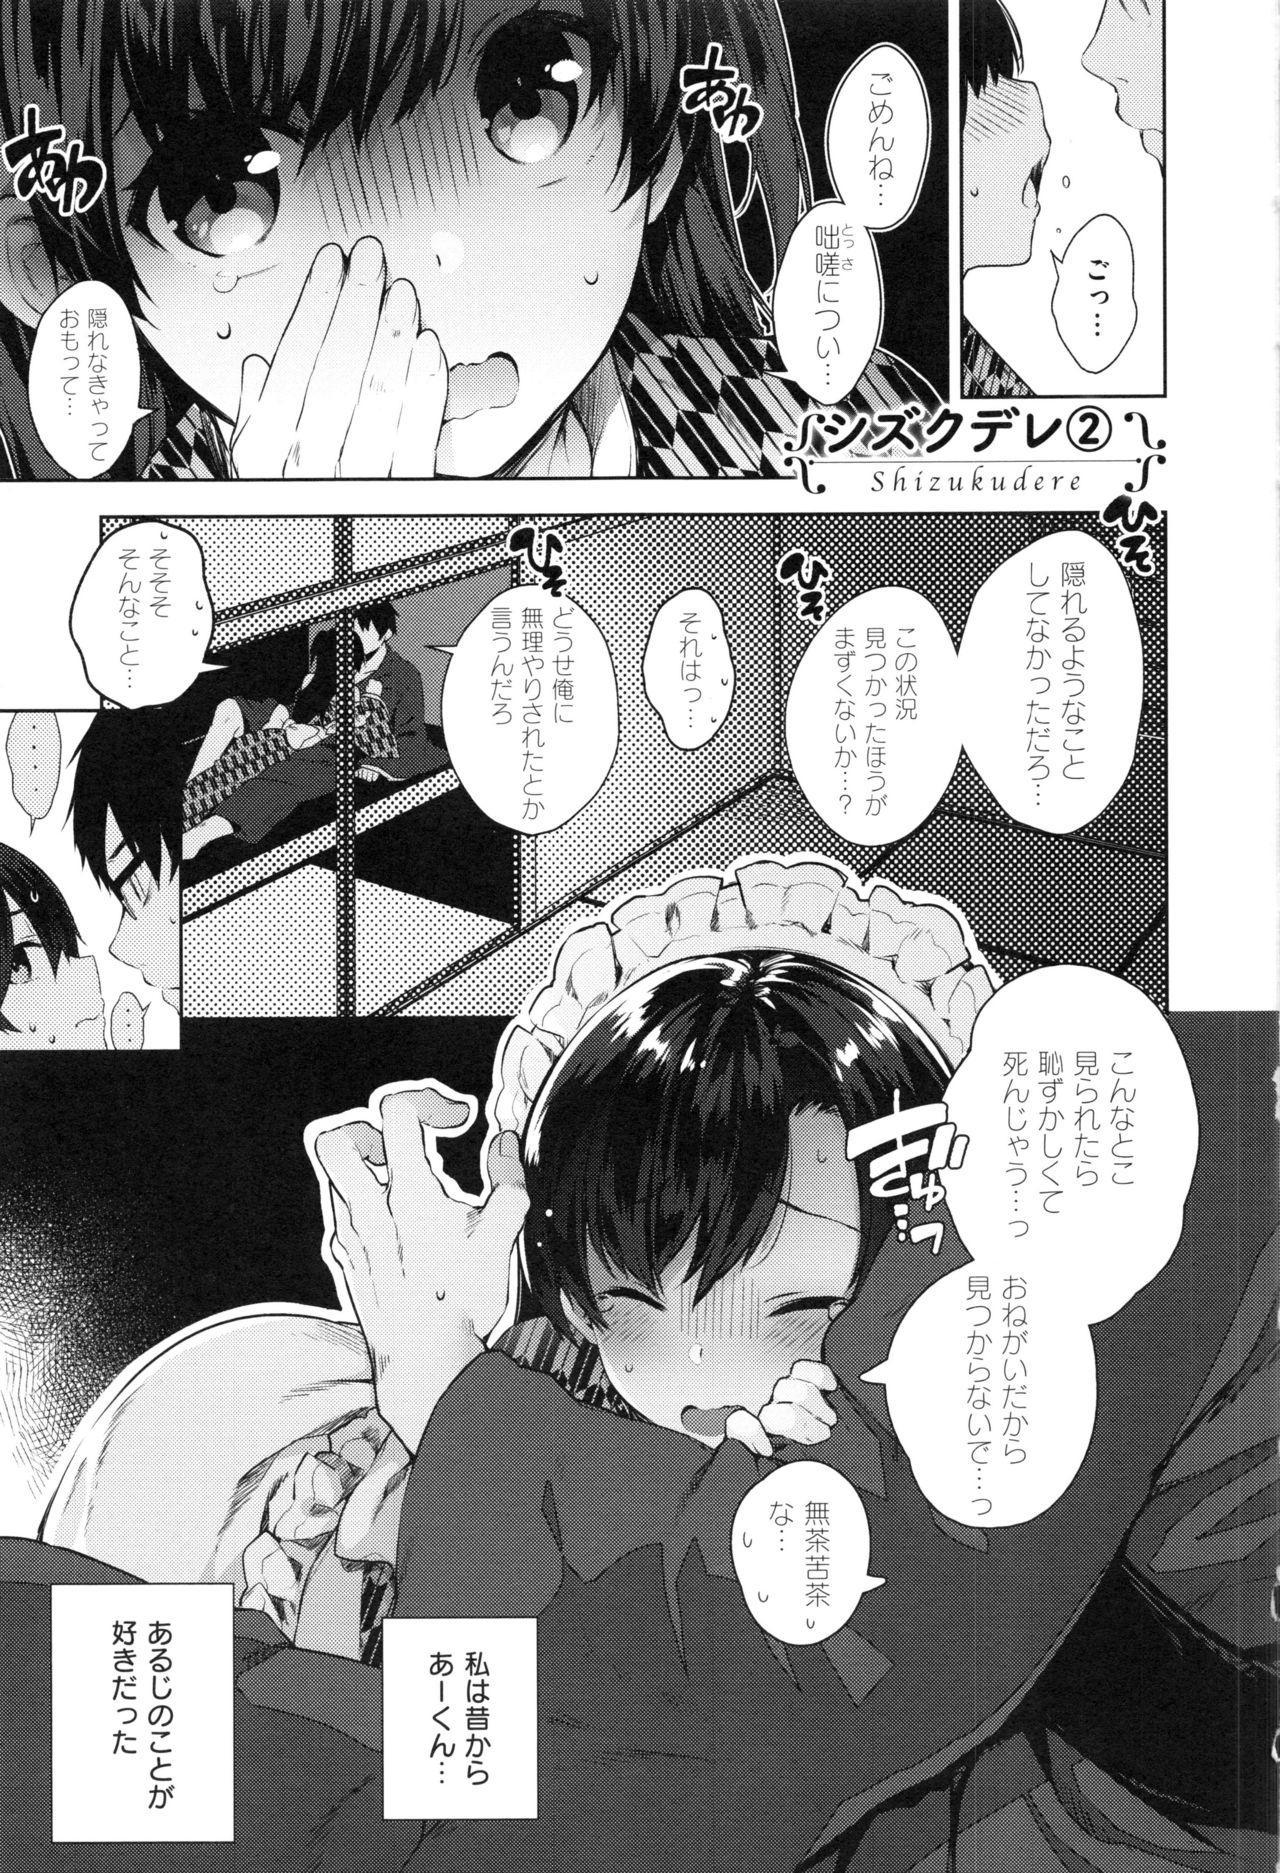 Himitsudere - Secret Love 82